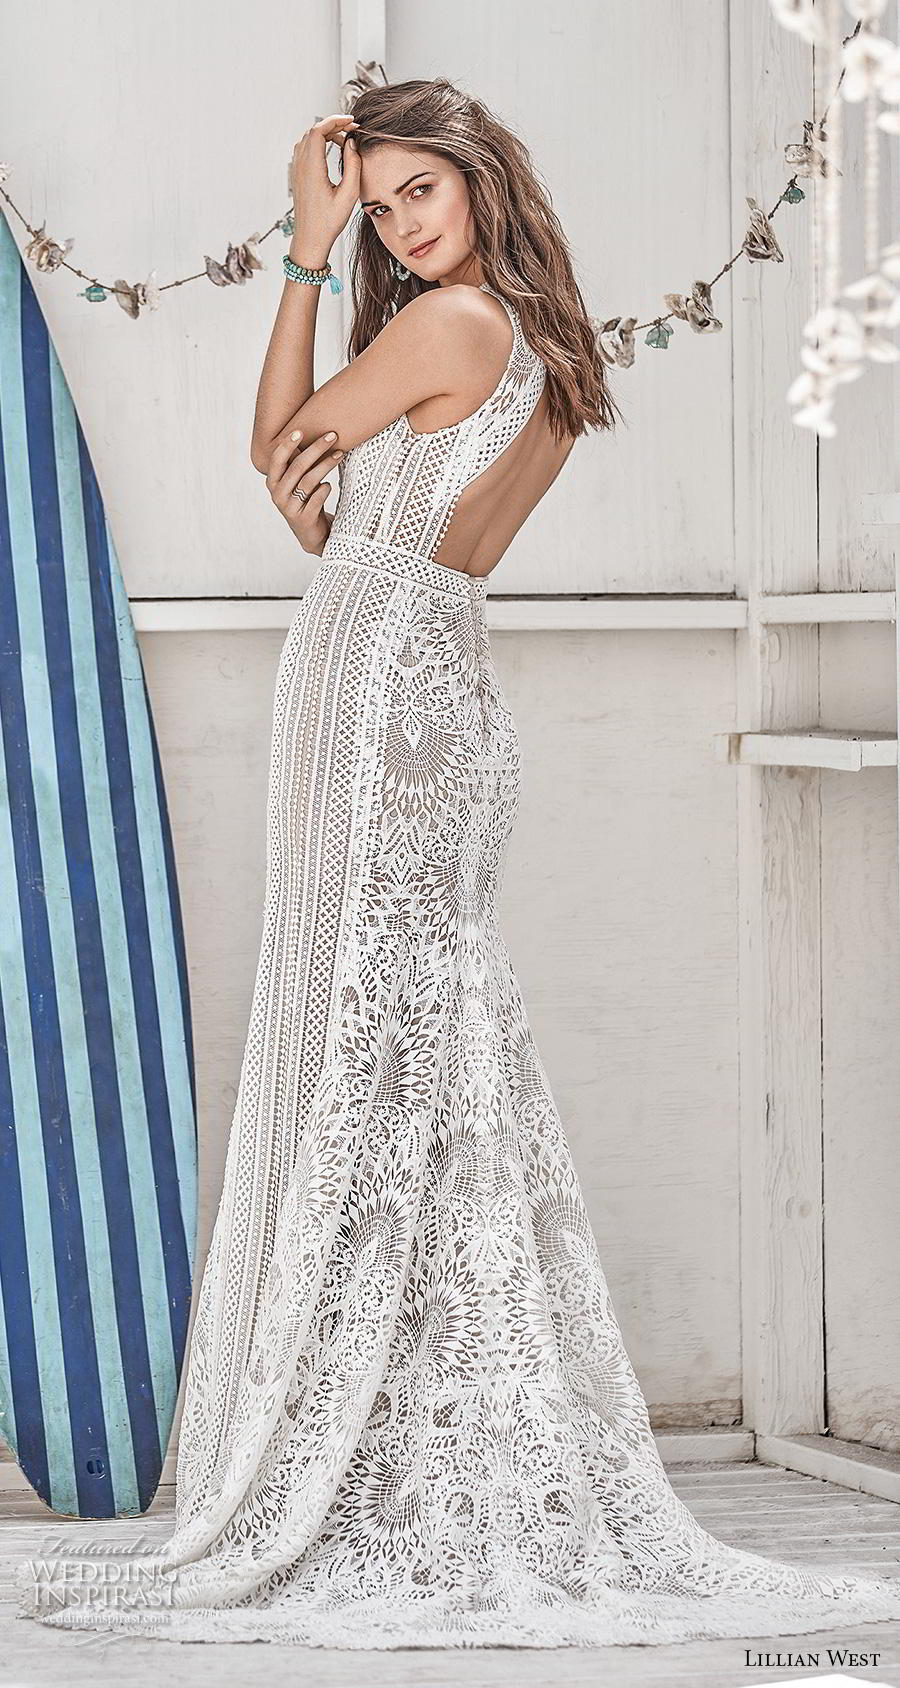 lillian west spring 2019 bridal sleeveless halter jewel neck full embellishment elegant fit and flare wedding dress keyhole back short train (6) bv